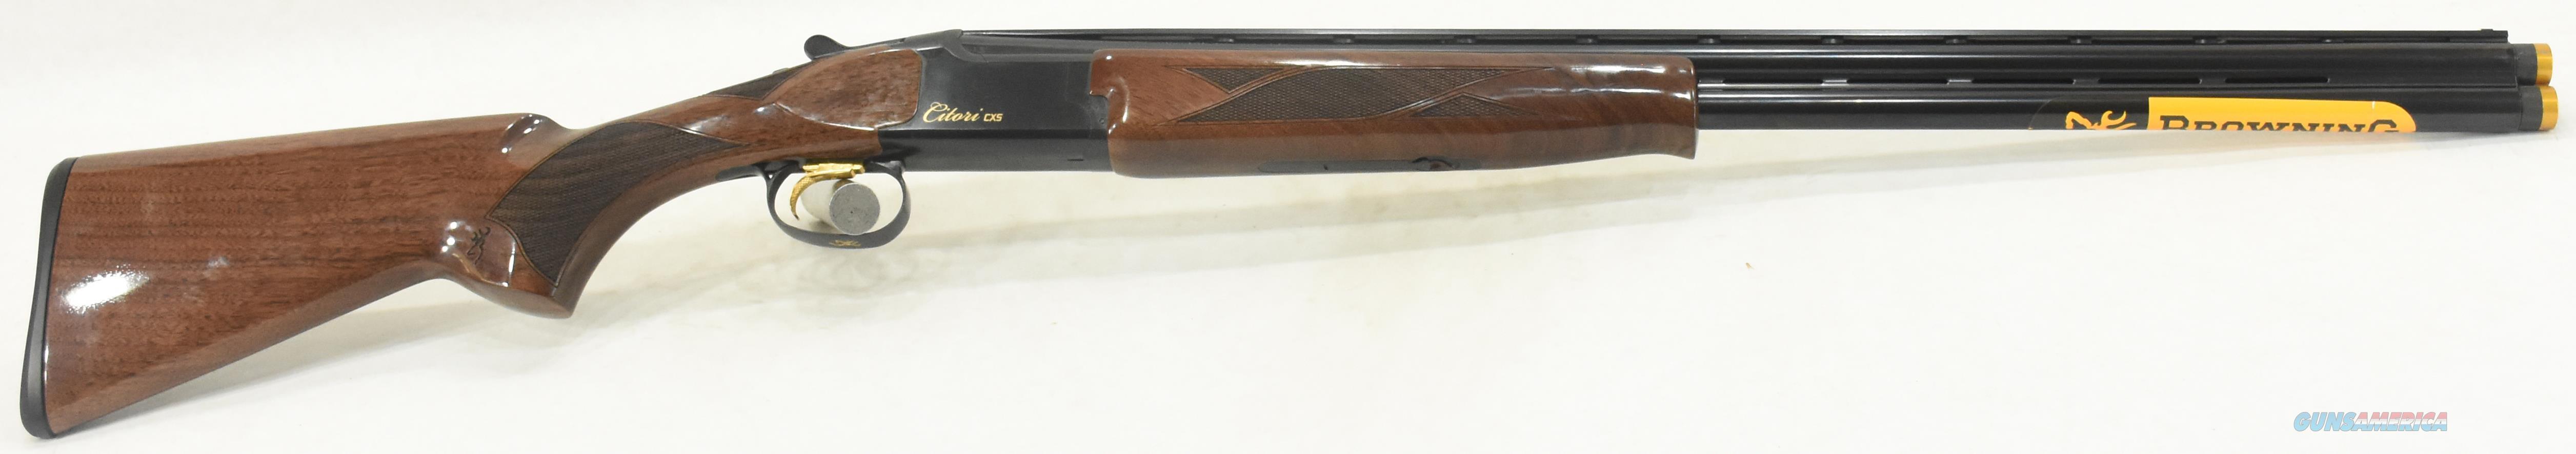 Citori CXS Micro Walnut 20Ga 26-3In 018140605  Guns > Shotguns > Browning Shotguns > Over Unders > Citori > Hunting